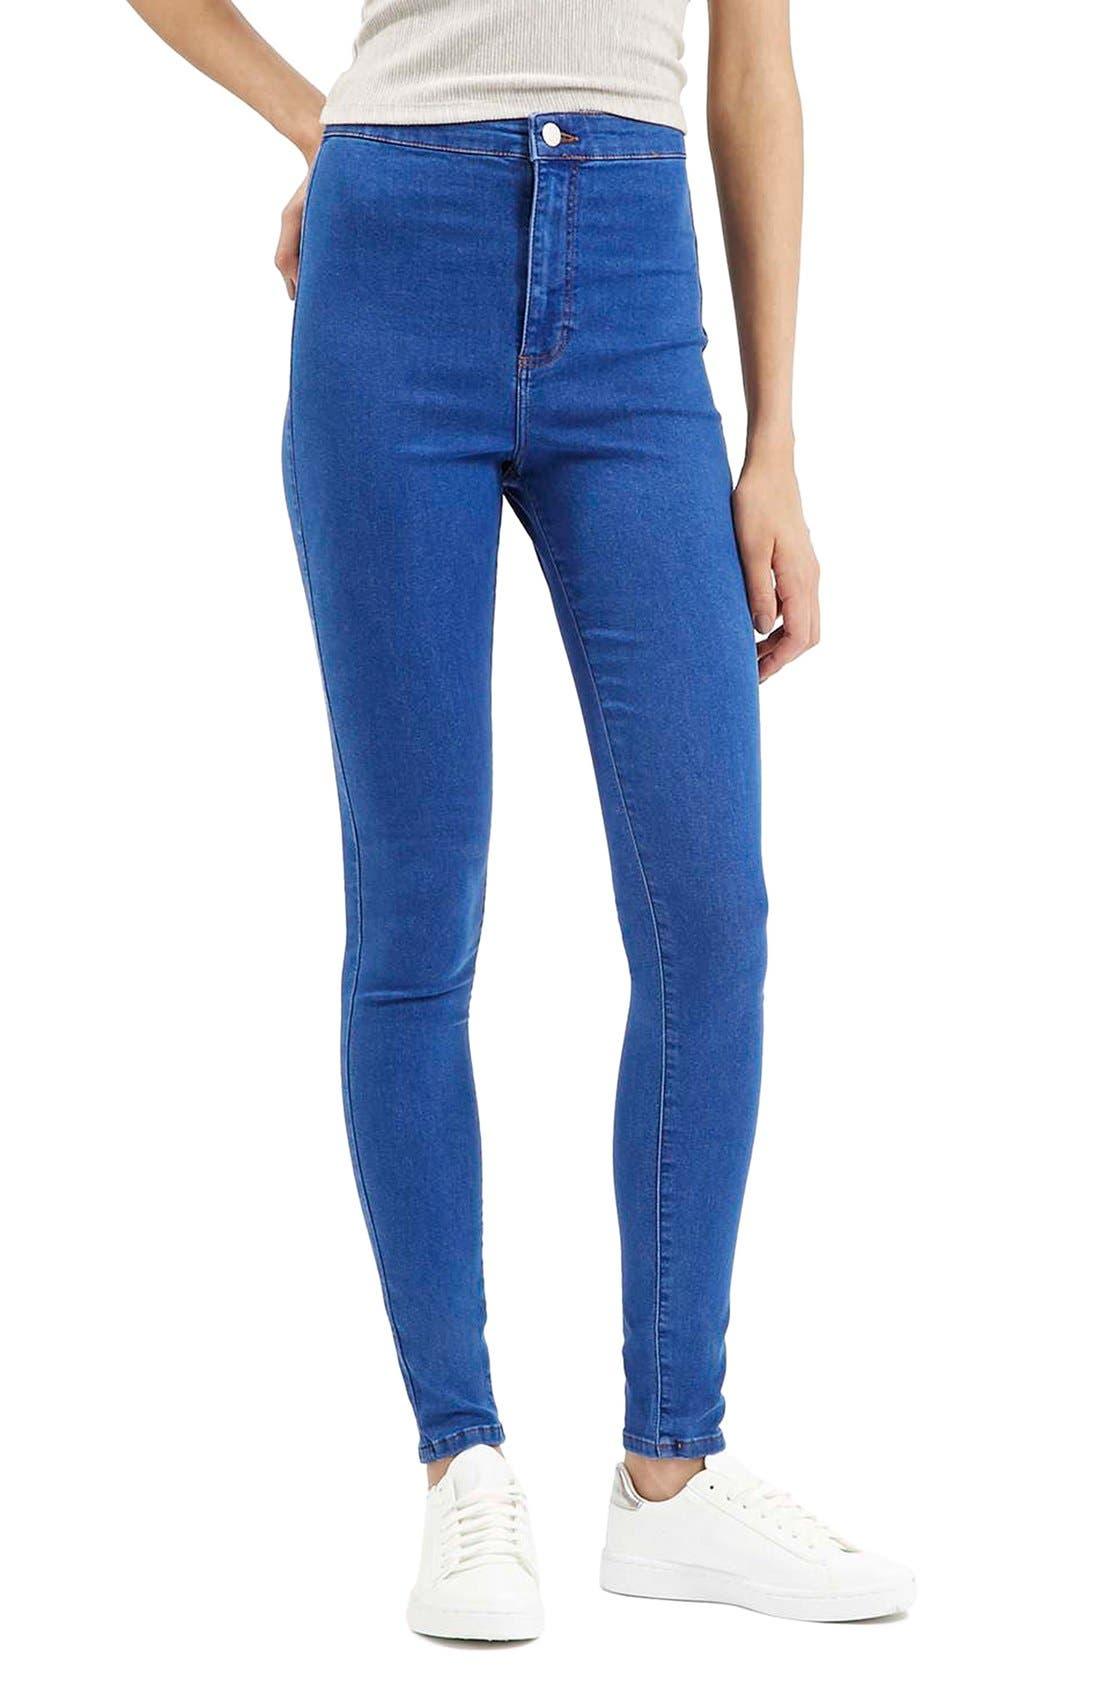 Alternate Image 1 Selected - Topshop'Joni' High Rise Skinny Jeans (Bright Blue)